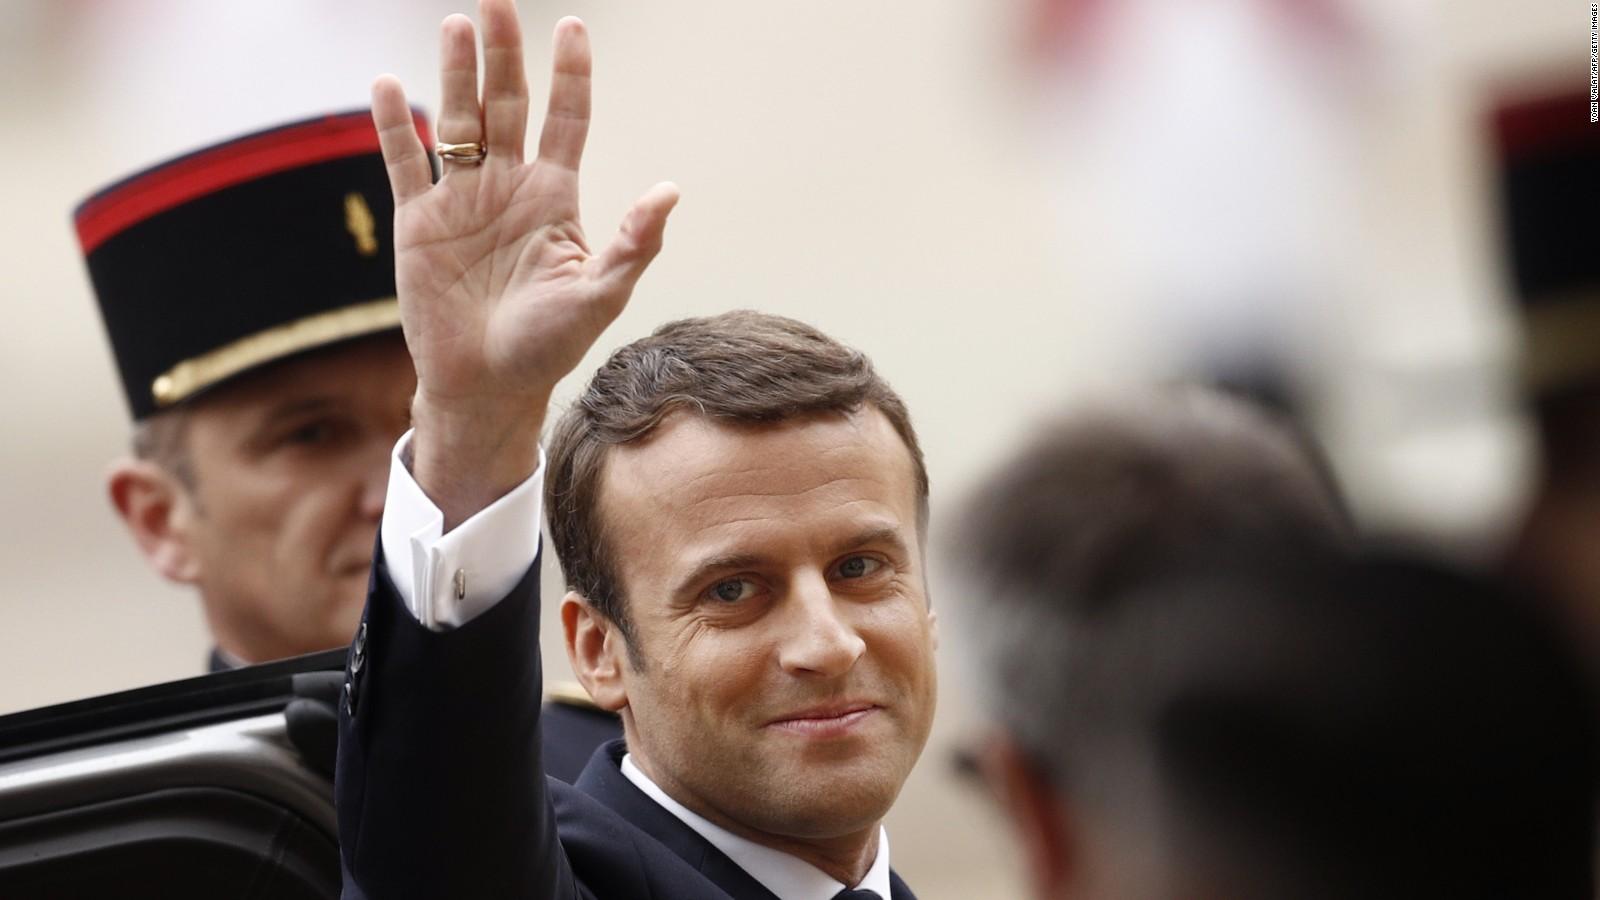 Emmanuel Macron Sworn In As French President Cnn